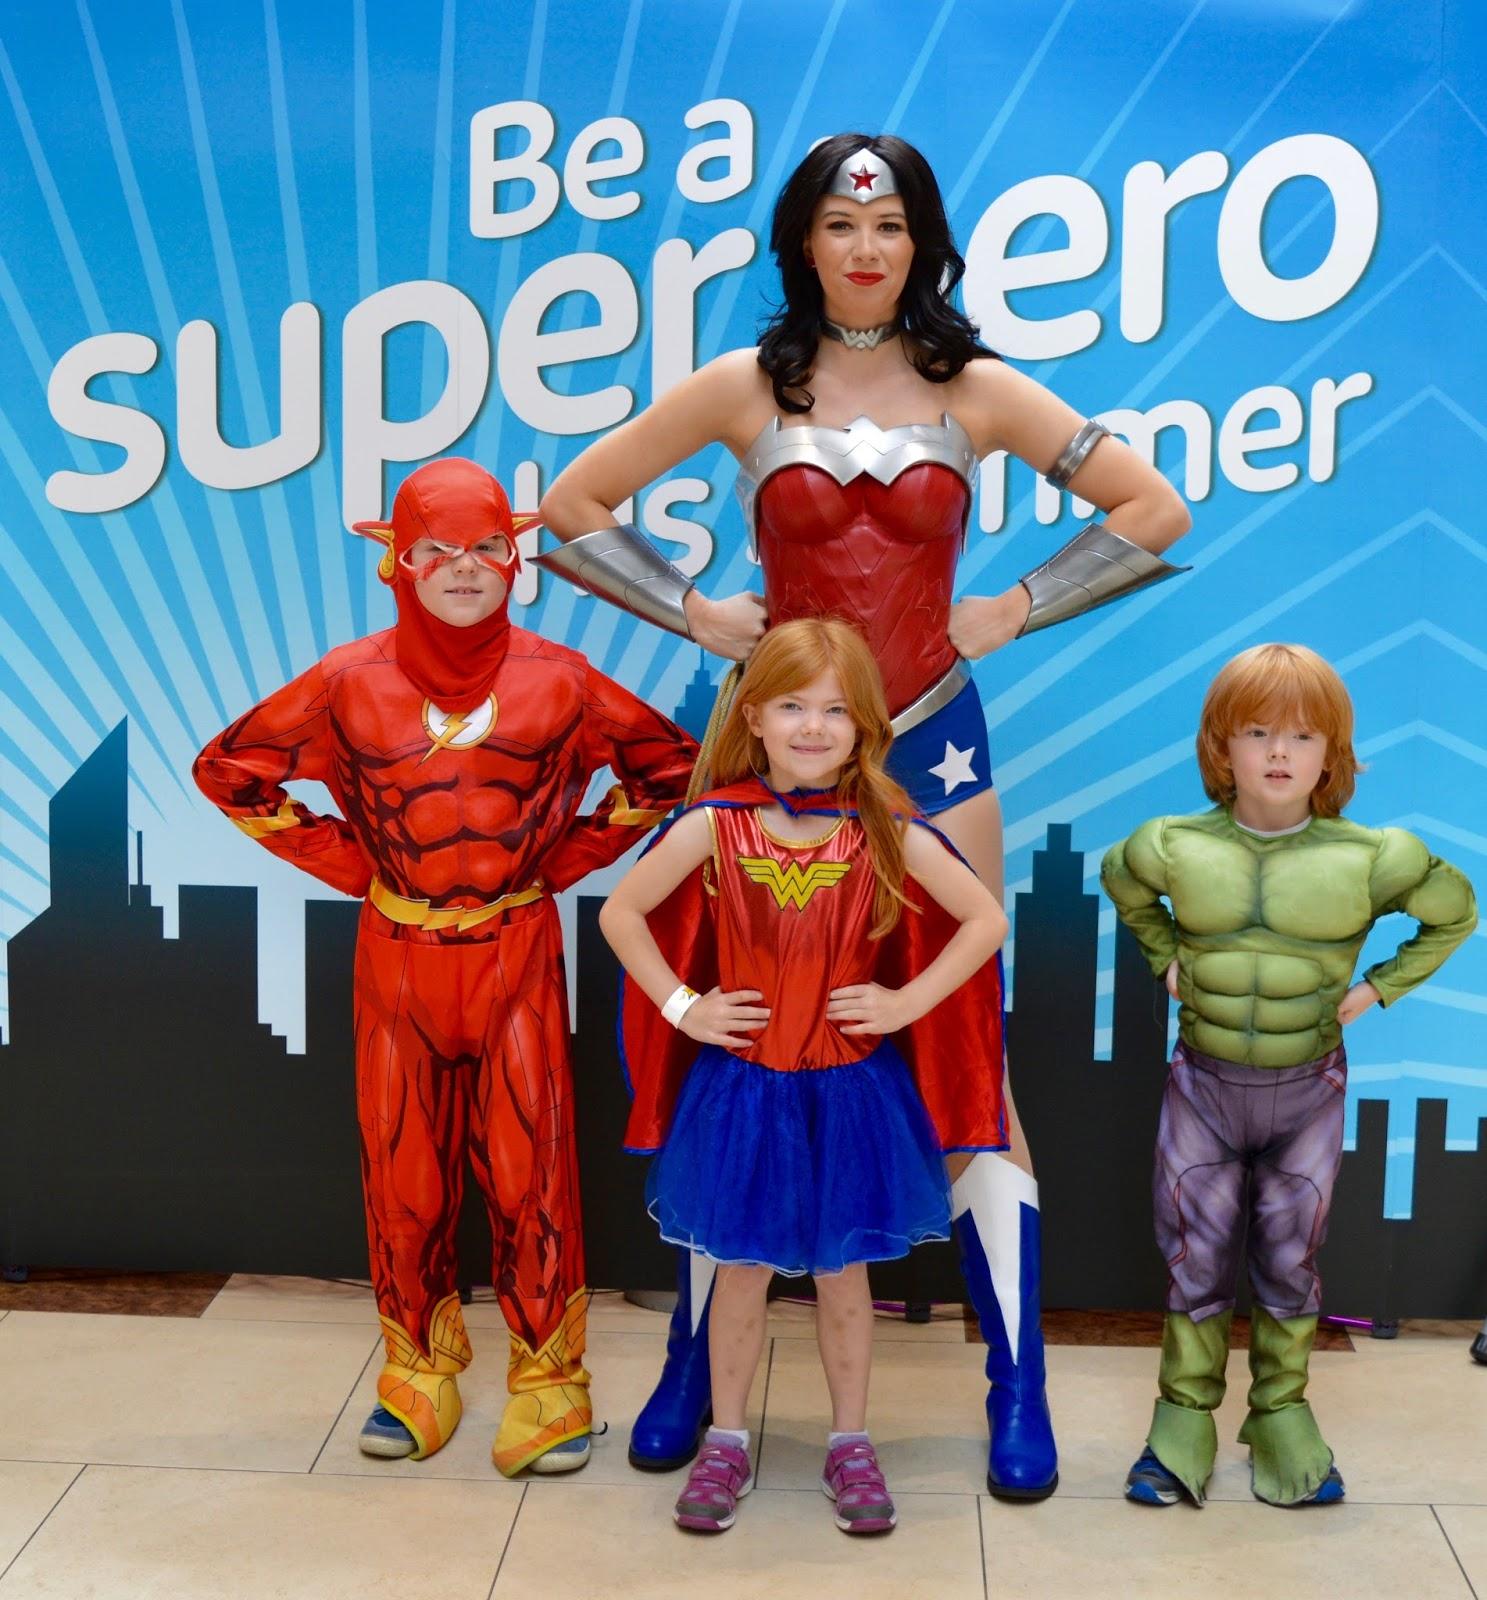 We Met Wonderwoman At Intu Eldon Square